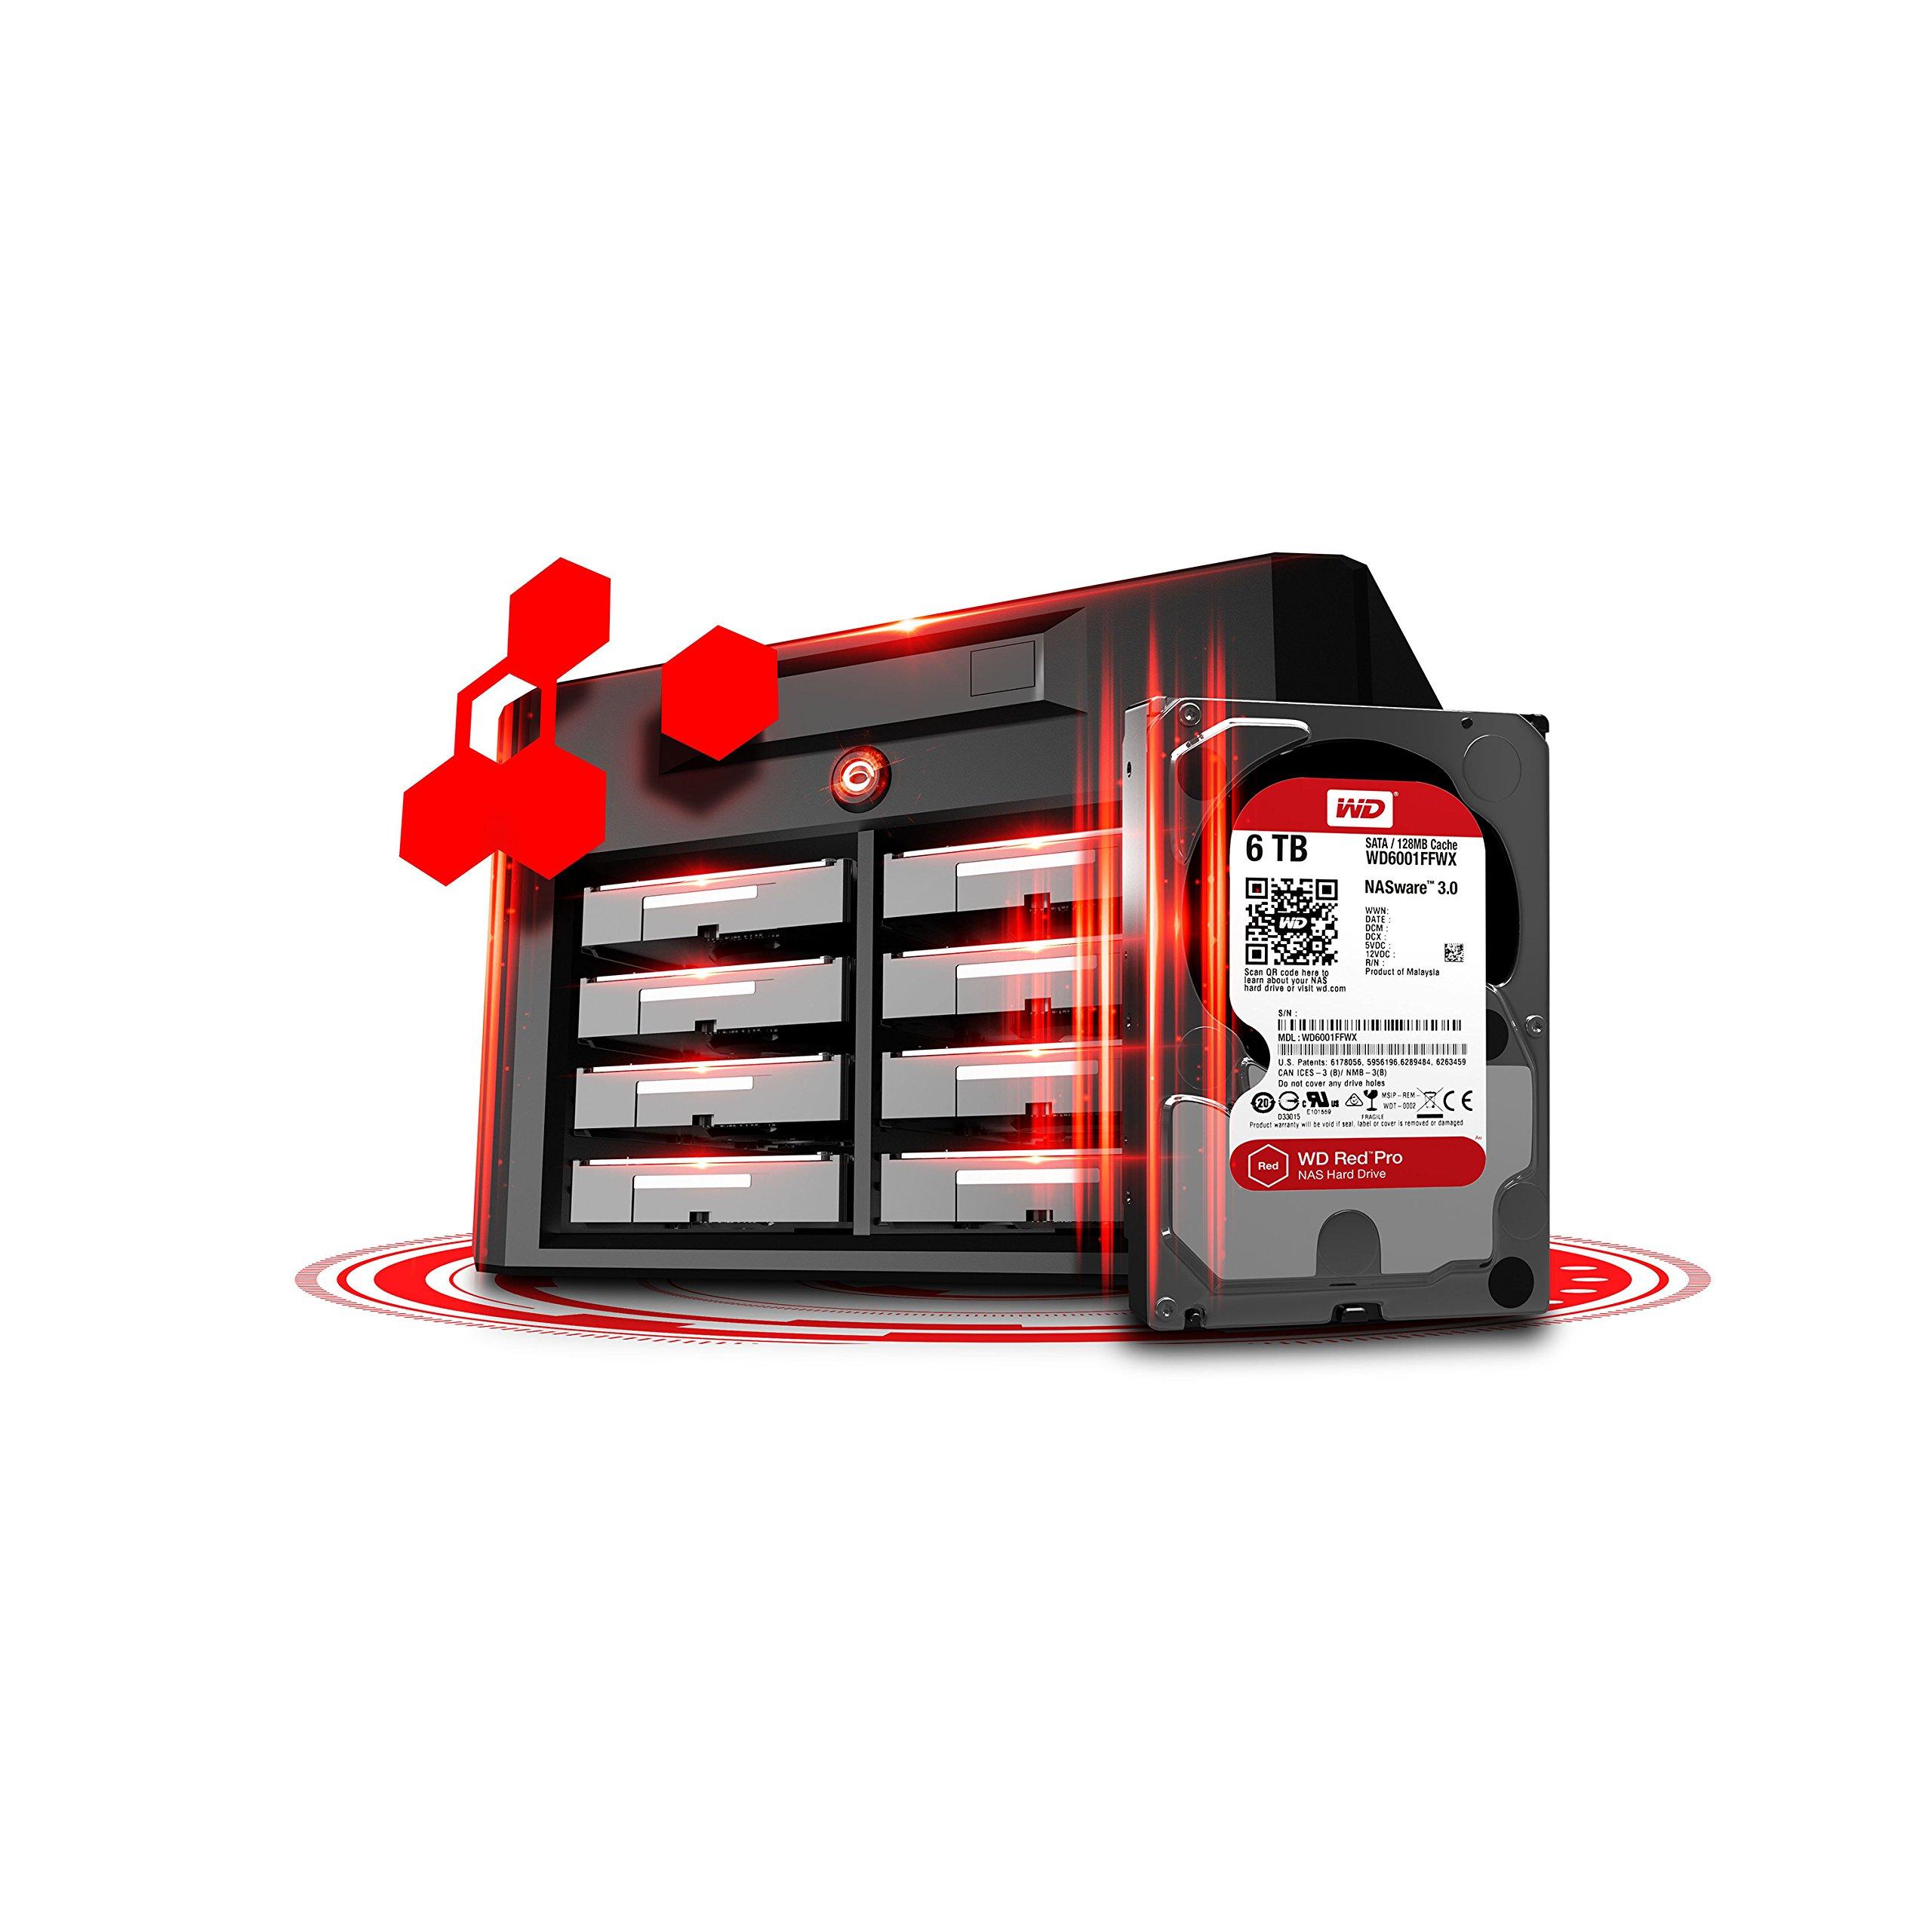 WD Red Pro 6TB 3.5-Inch SATA III 7200rpm 128MB Cache NAS Internal Hard Drive (WD6002FFWX) by Western Digital